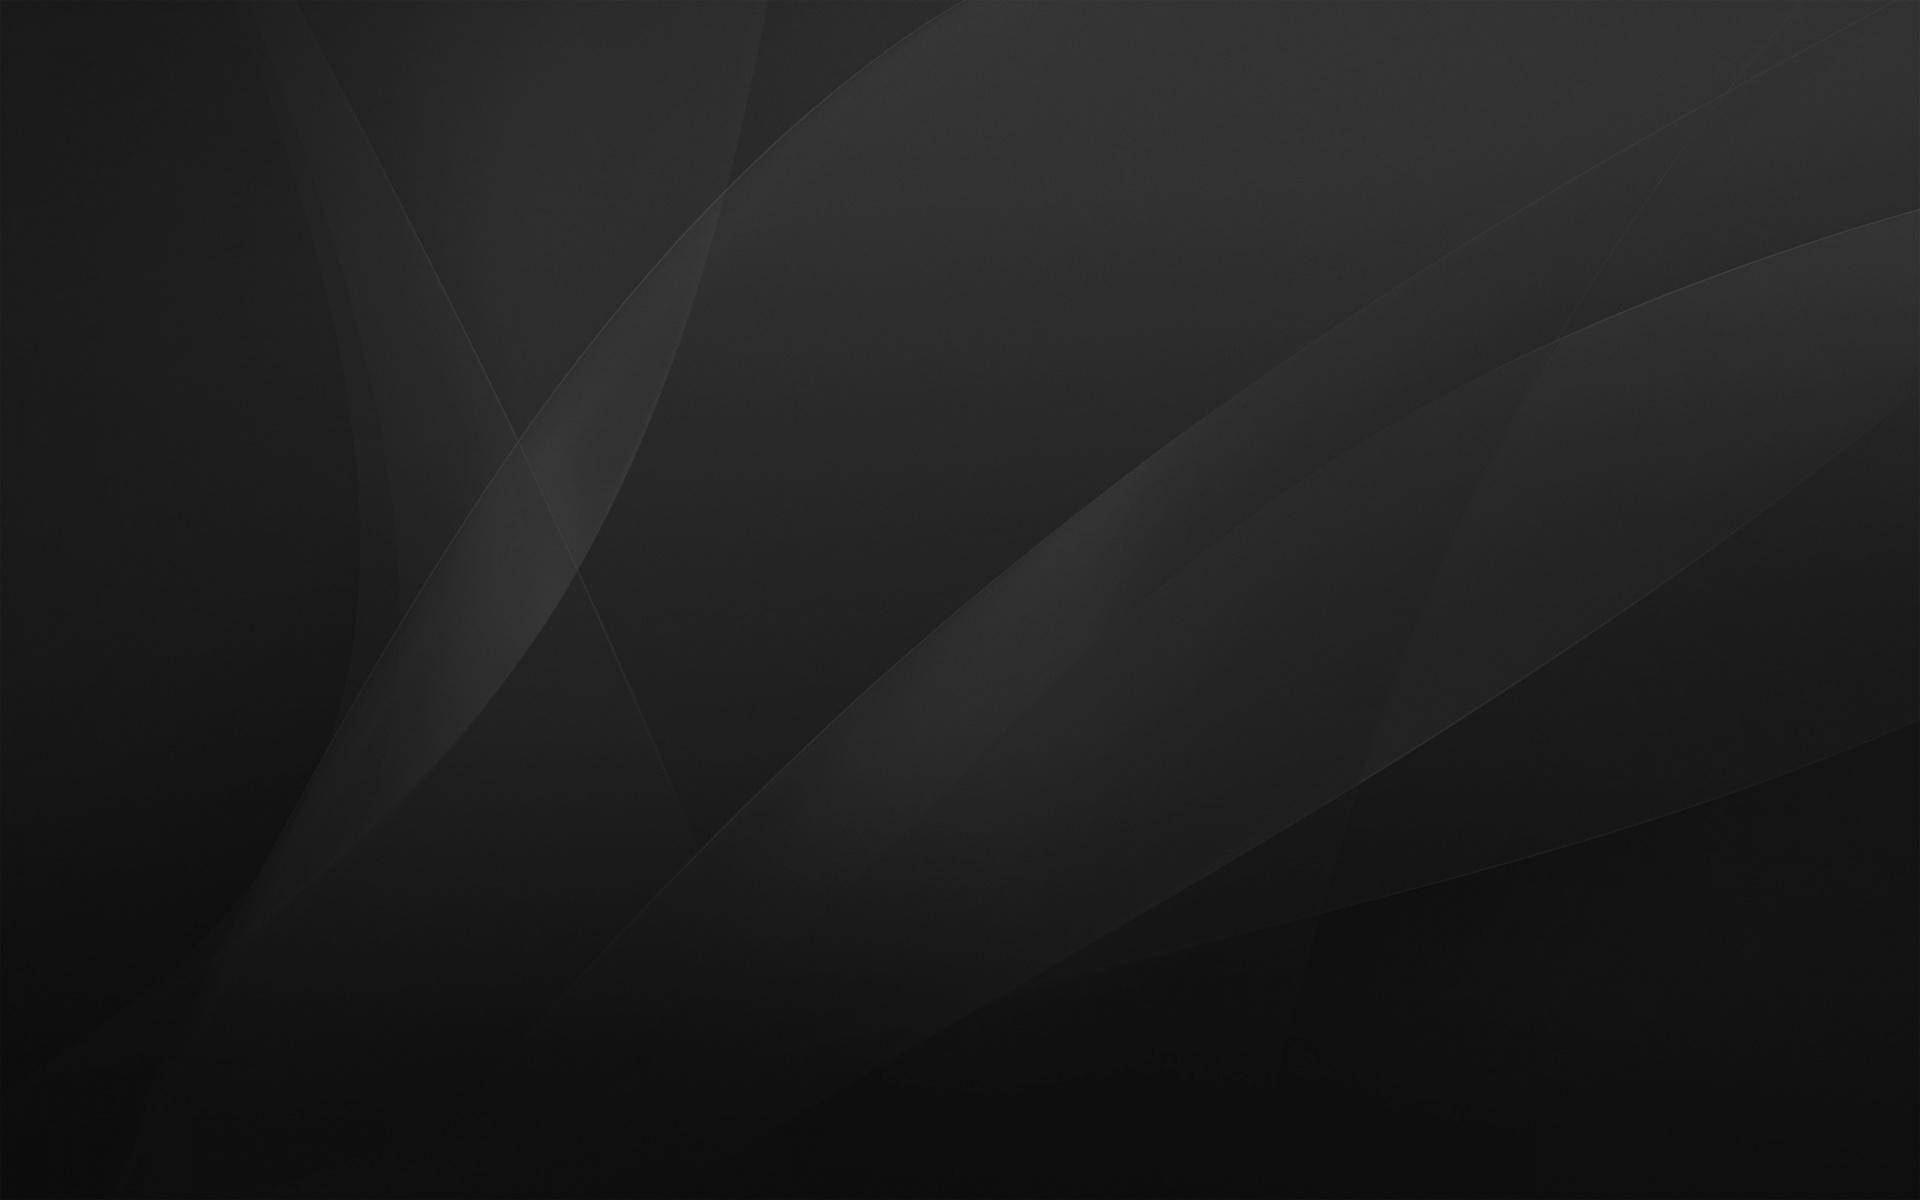 black background 1920x1200 - photo #7